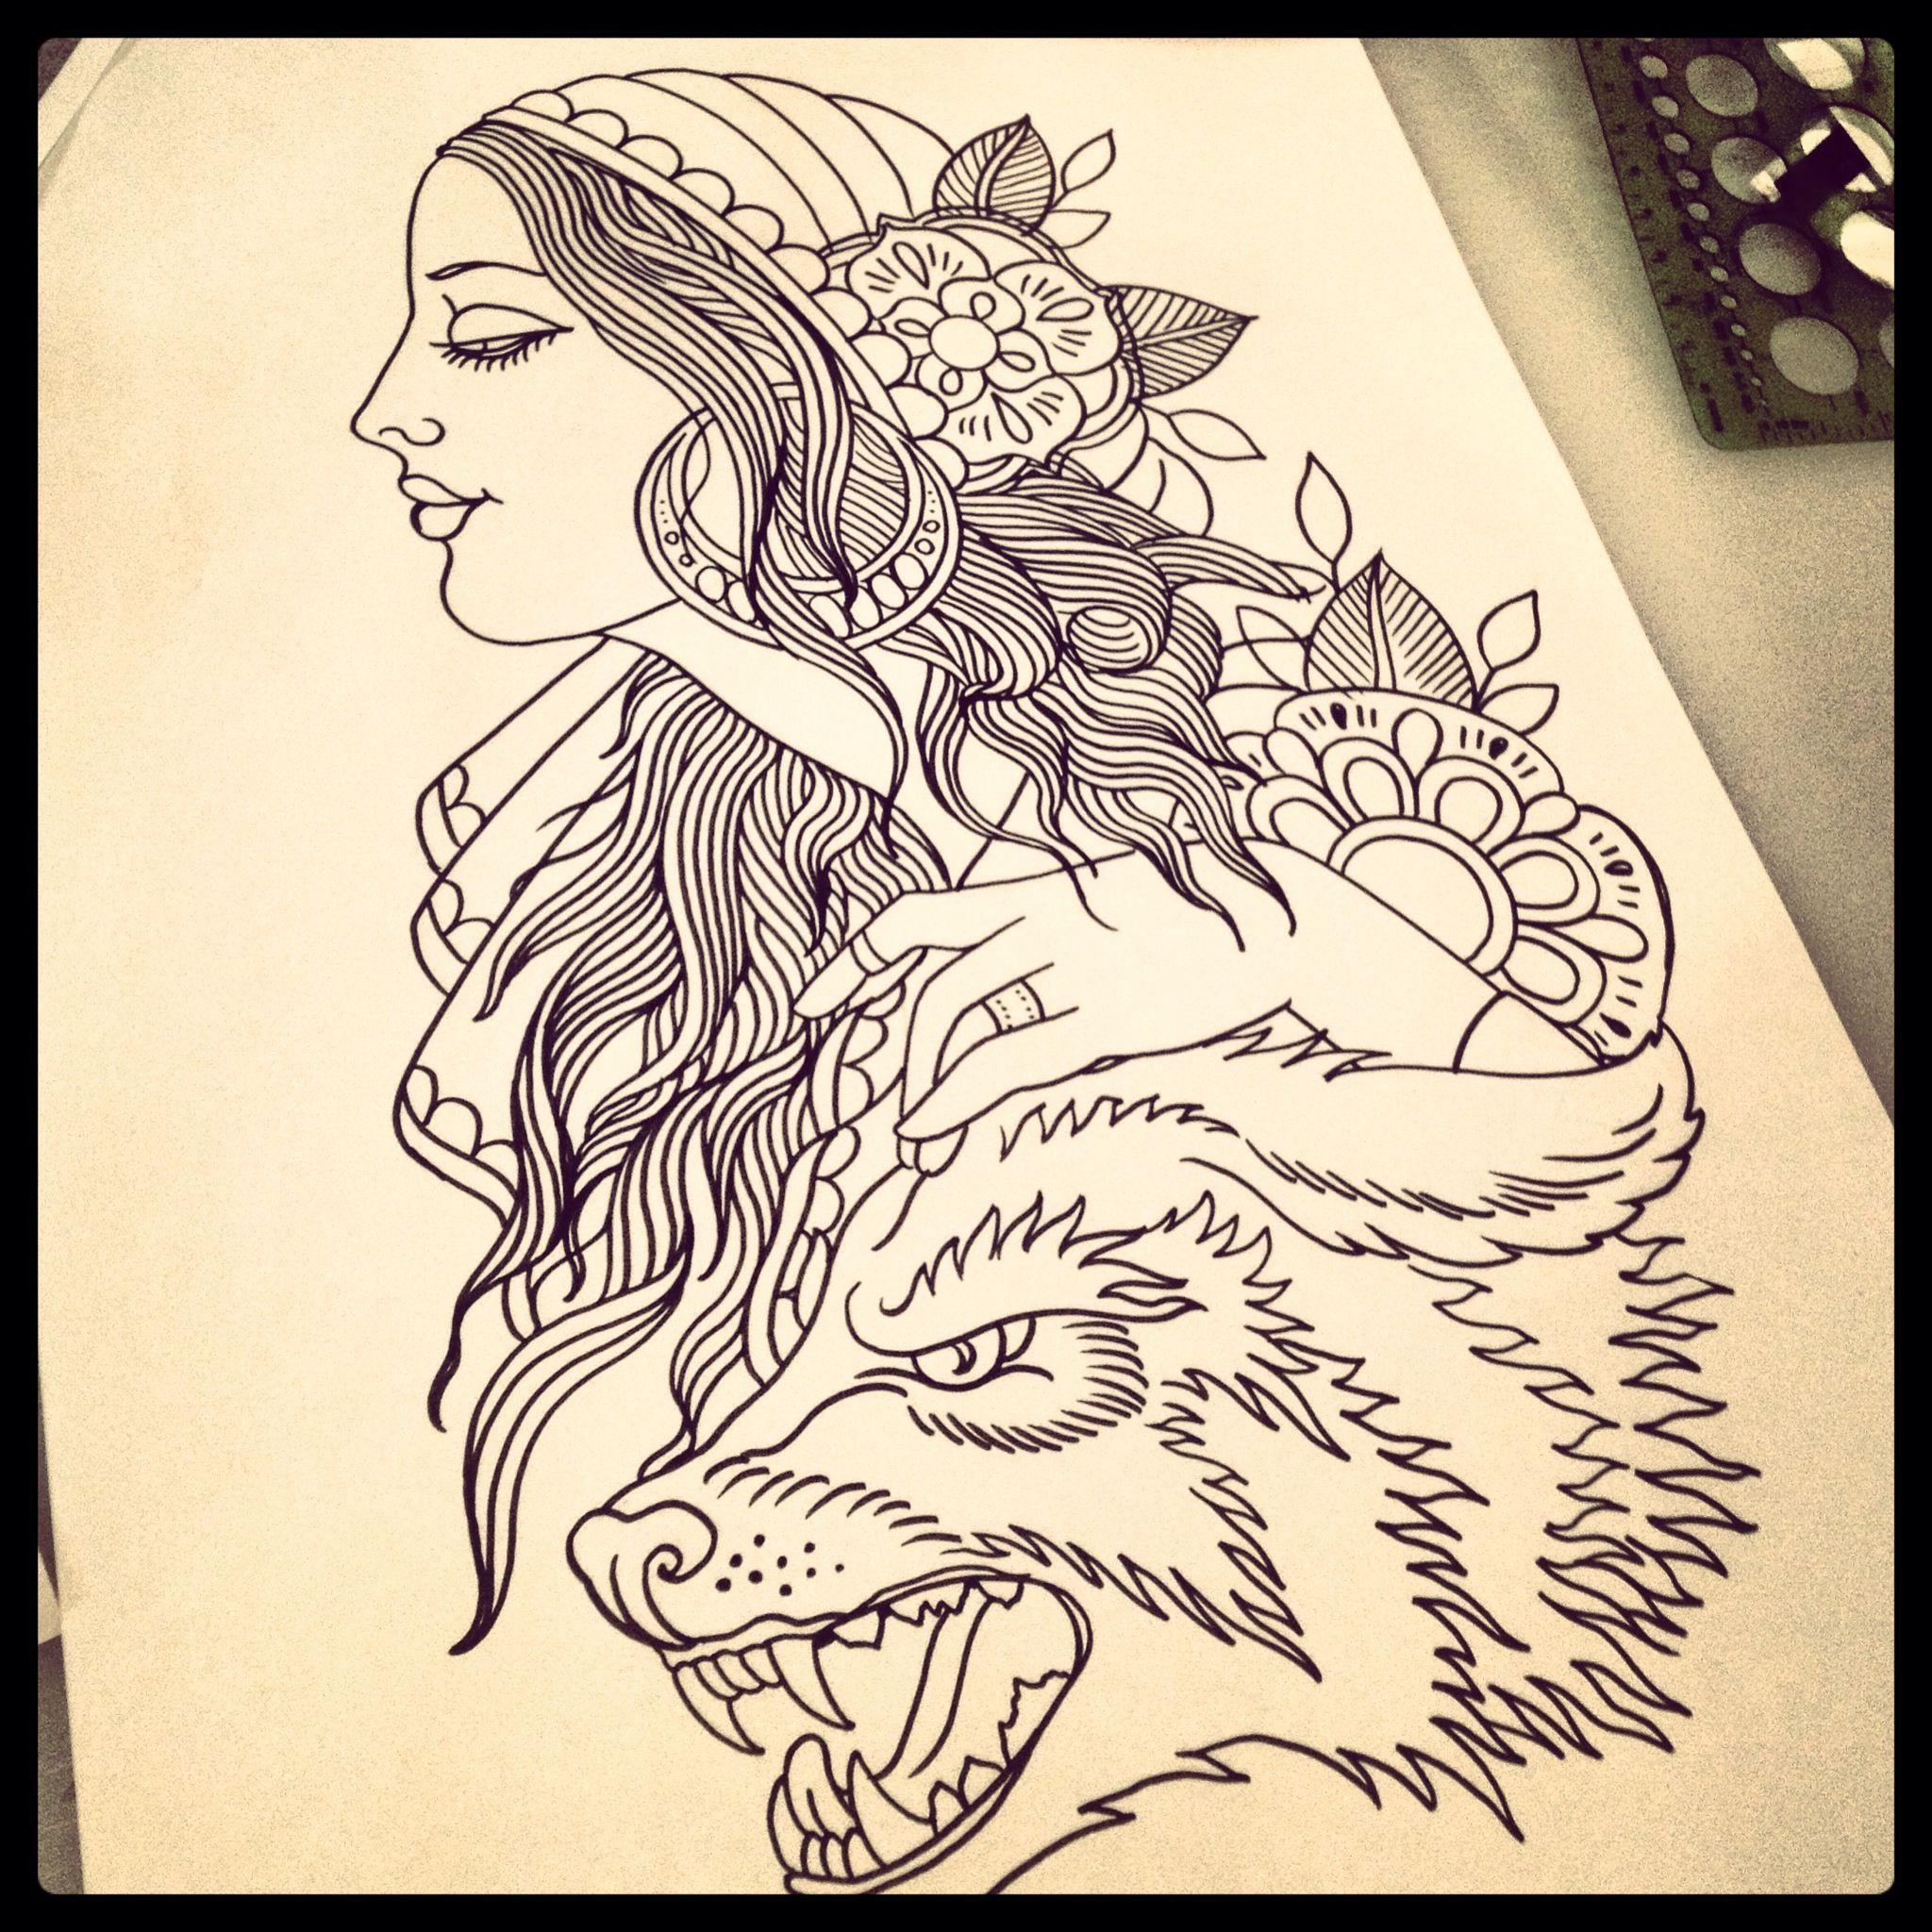 Pin On Art Illustrations Drawings By Lauren B